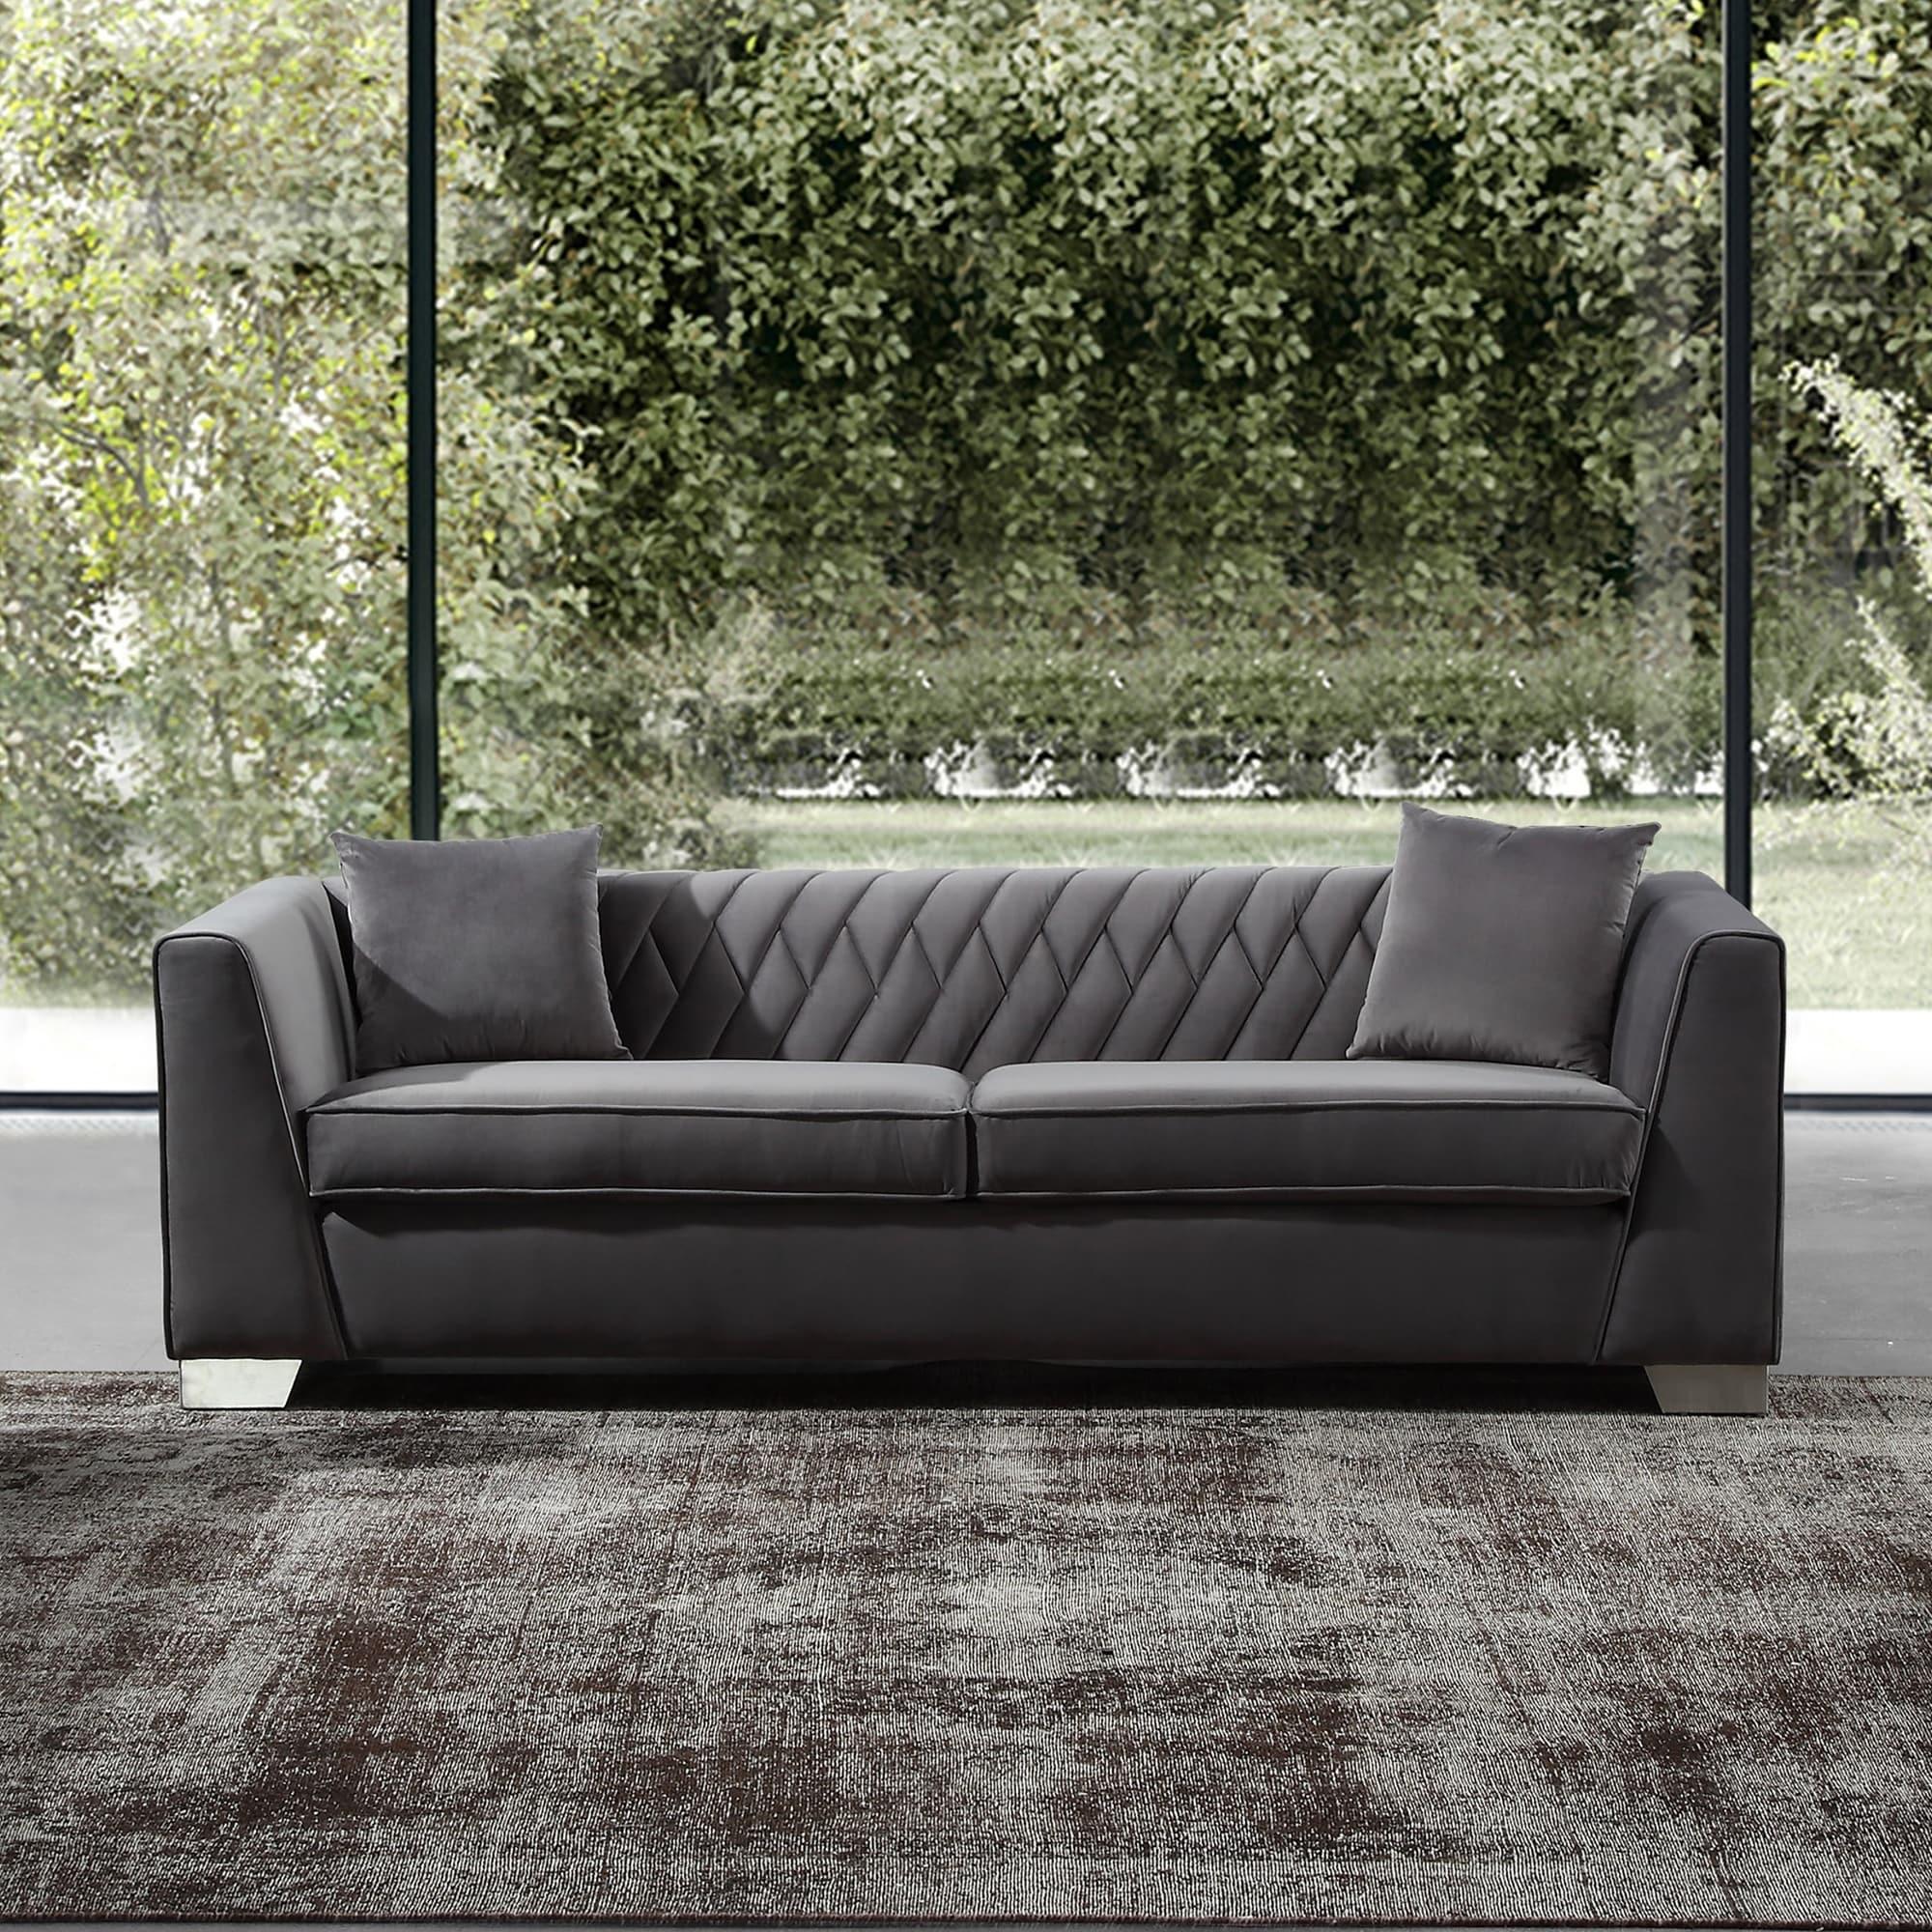 Bon Shop Armen Living Cambridge Sofa In Stainless Steel And Dark Grey Velvet    Free Shipping Today   Overstock.com   19448171